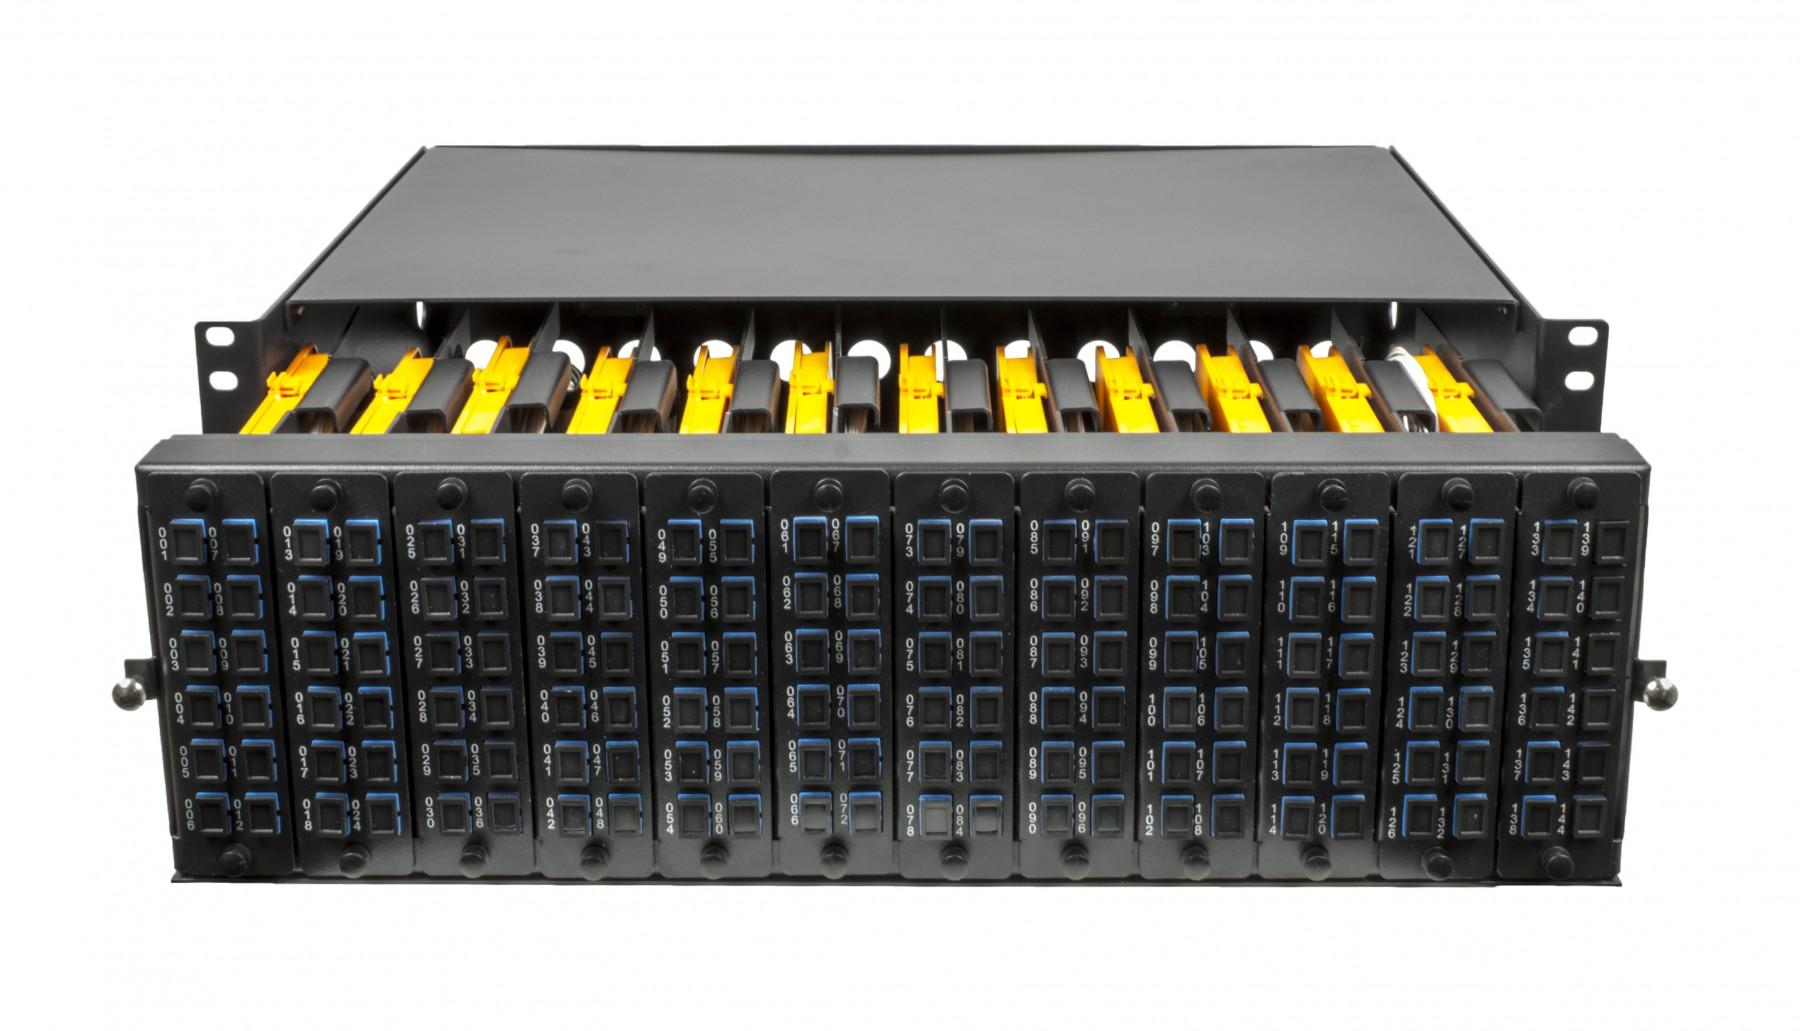 Lc 288 Fibre Mgx Modular Patch Panel 3u Odf